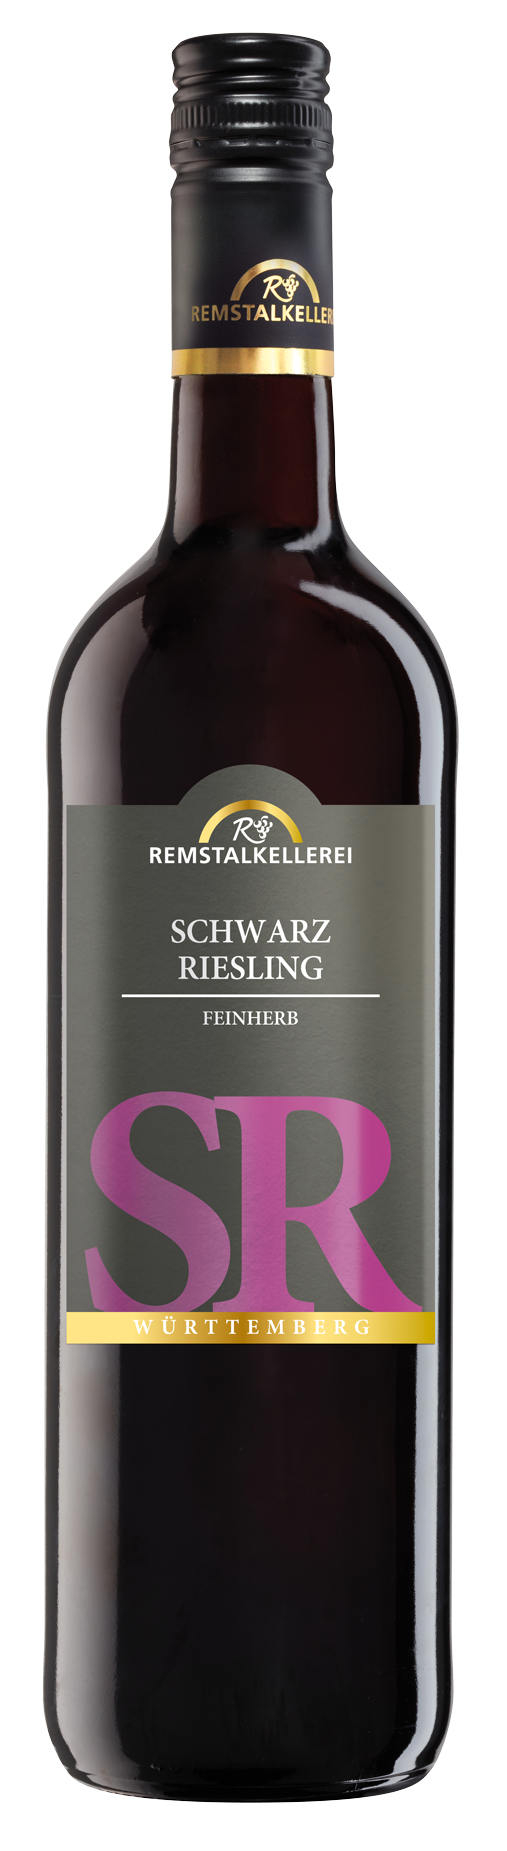 "Schwarzriesling ""SR"" feinherb"